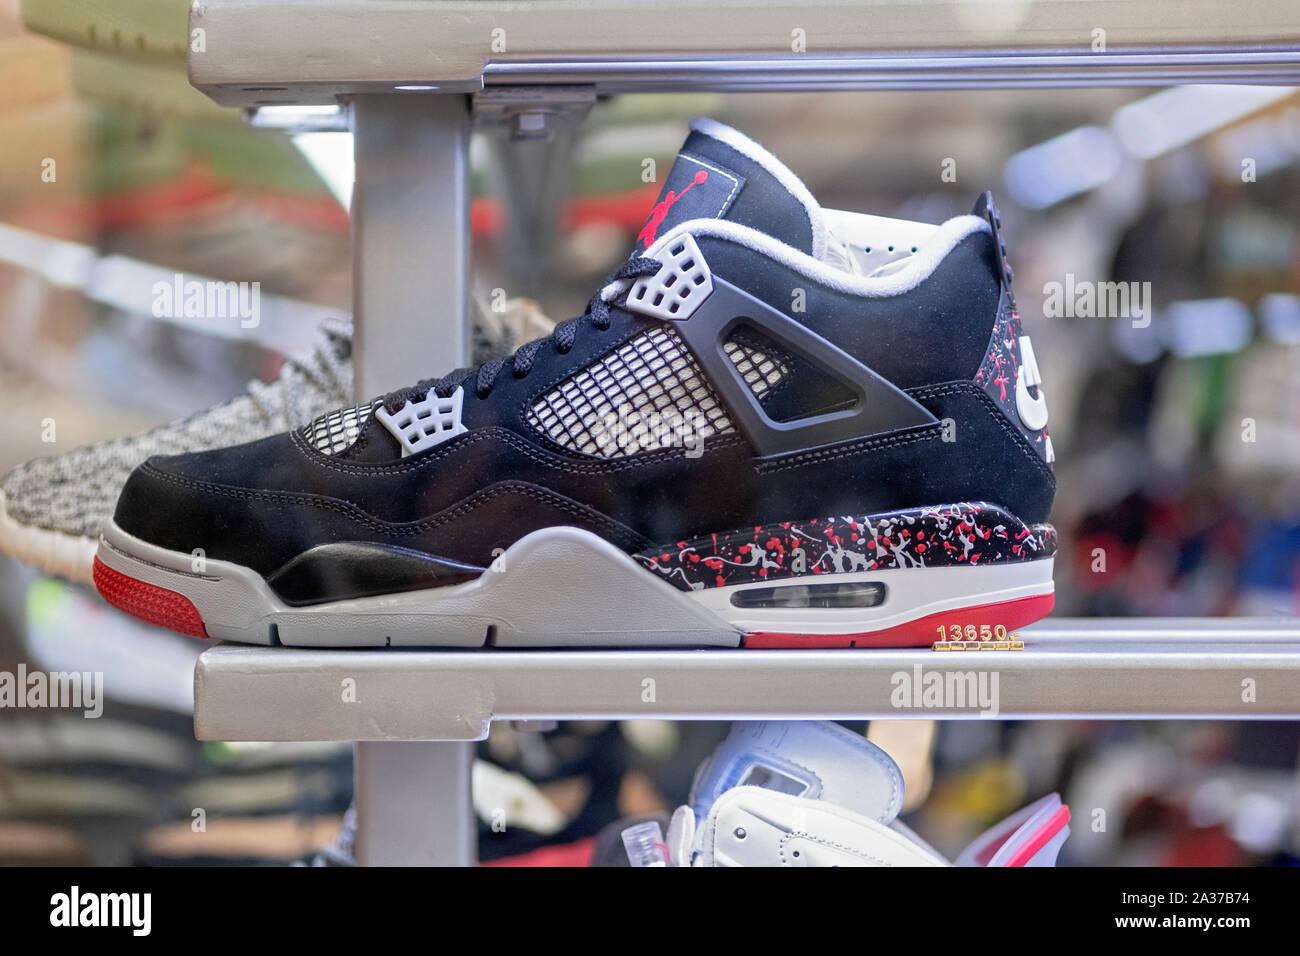 Air Jordan Schuhe Stockfotos & Air Jordan Schuhe Bilder Alamy